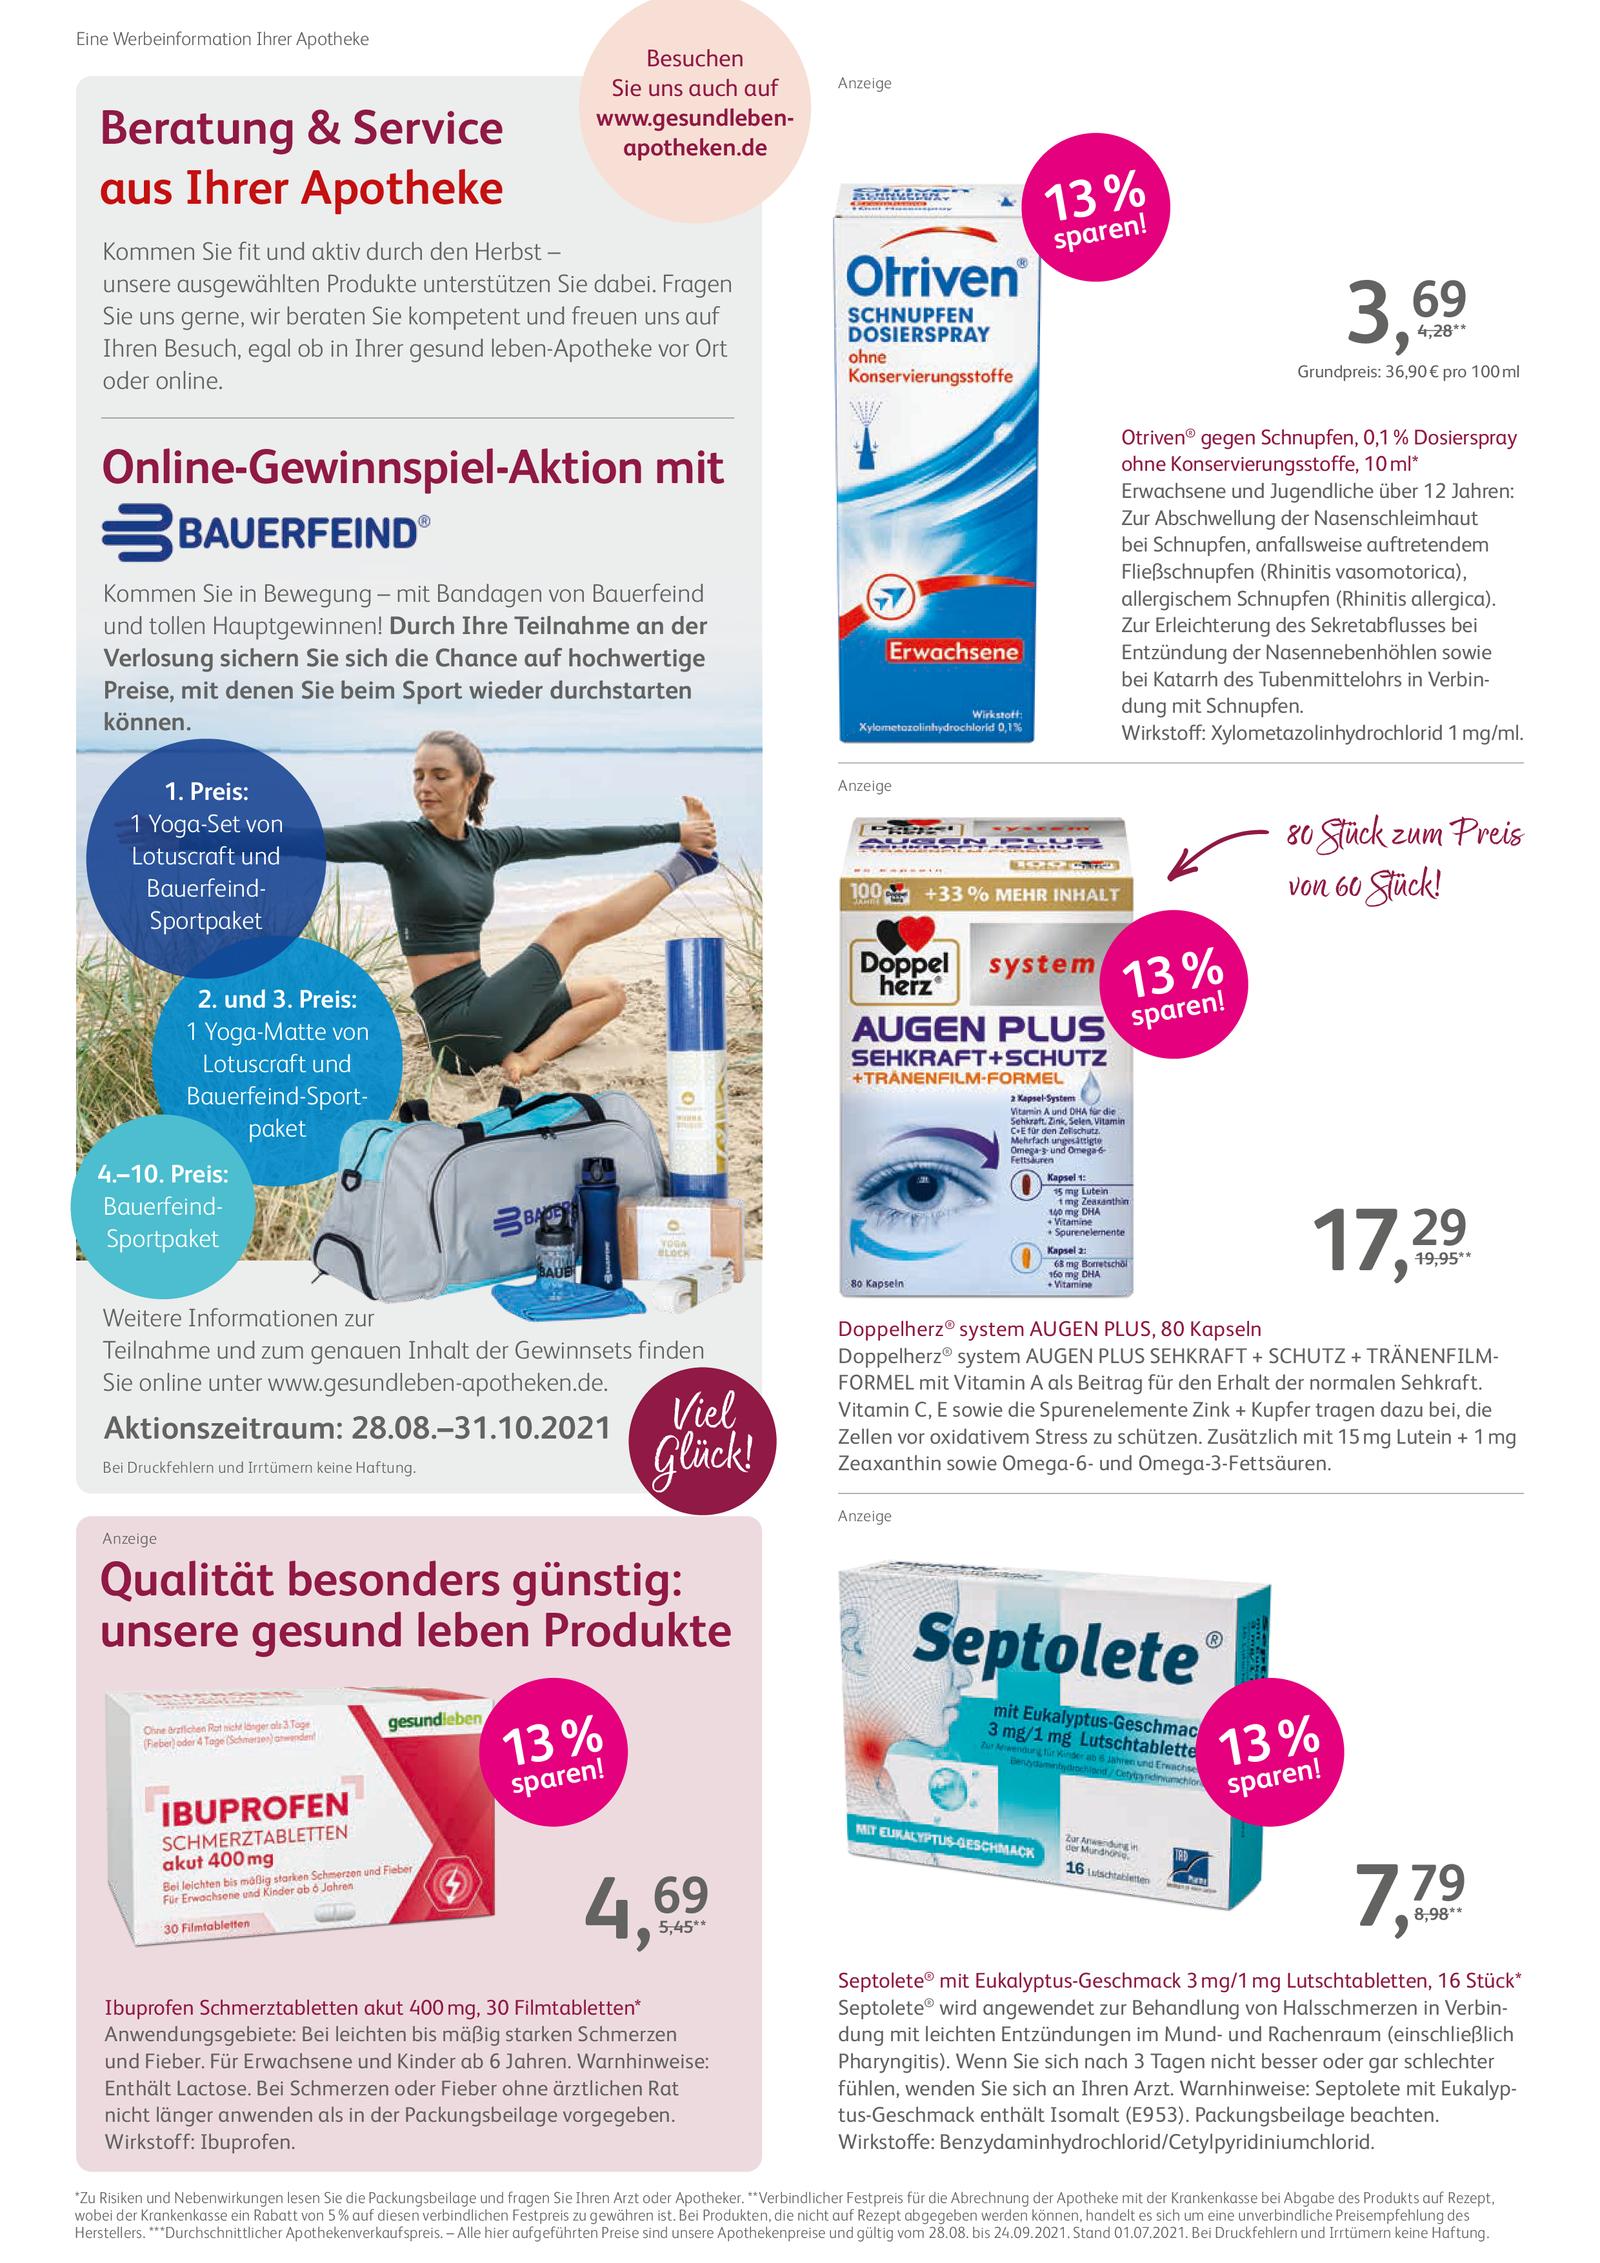 https://mein-uploads.apocdn.net/15913/leaflets/gesundleben_niedrig-Seite2.png